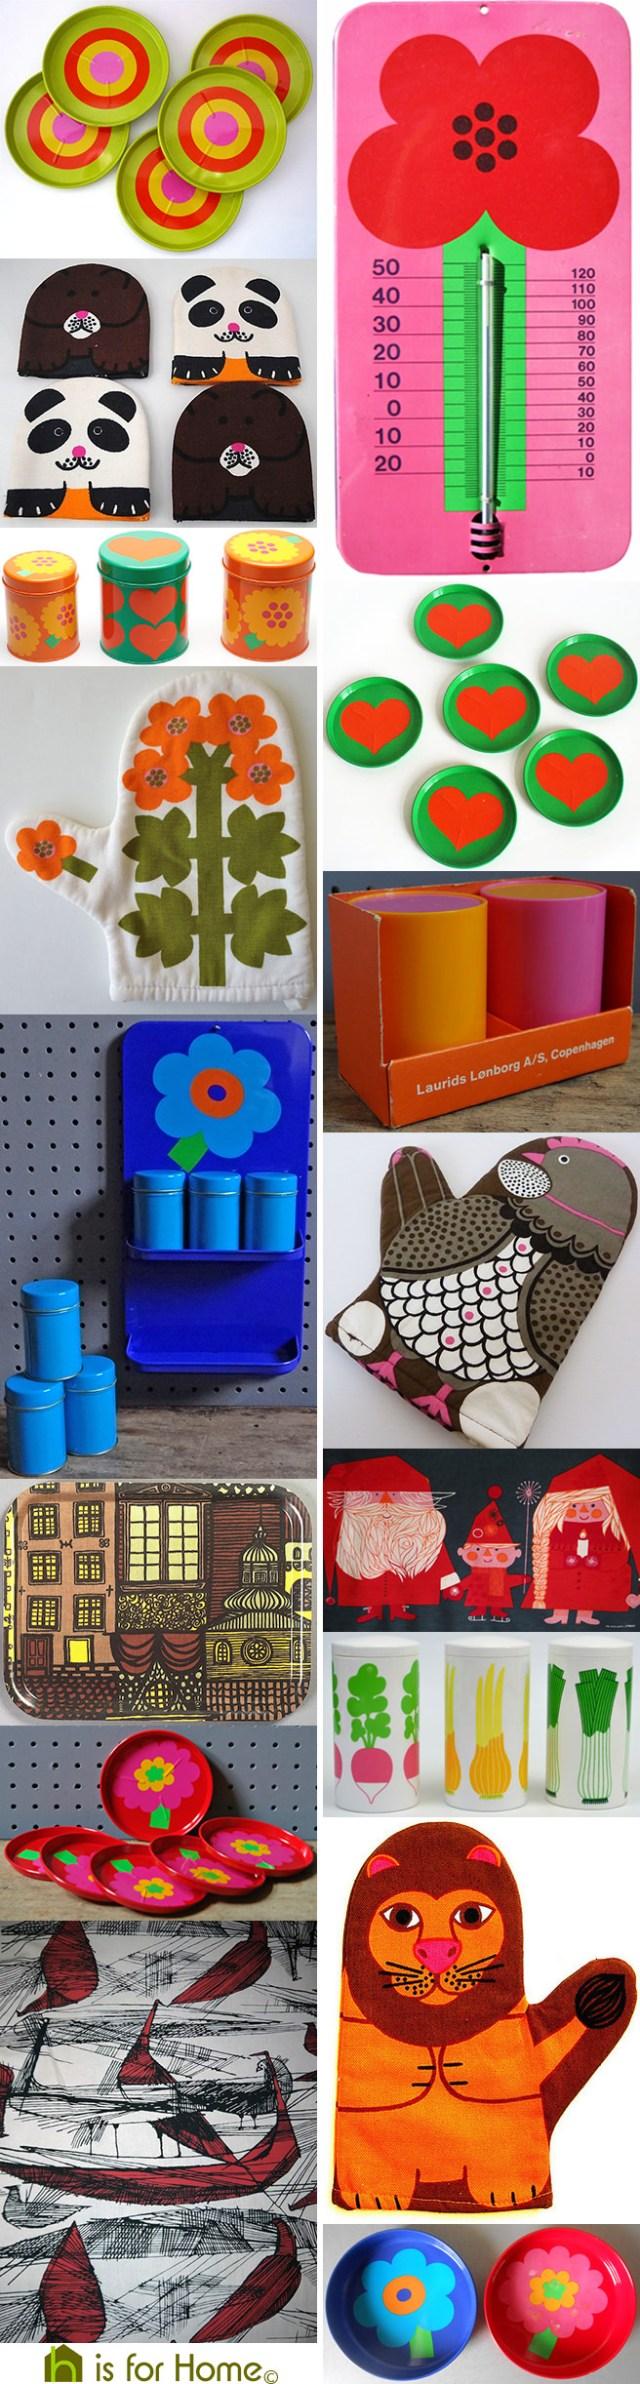 Mosaic of Al & Lena Eklund designs | H is for Home